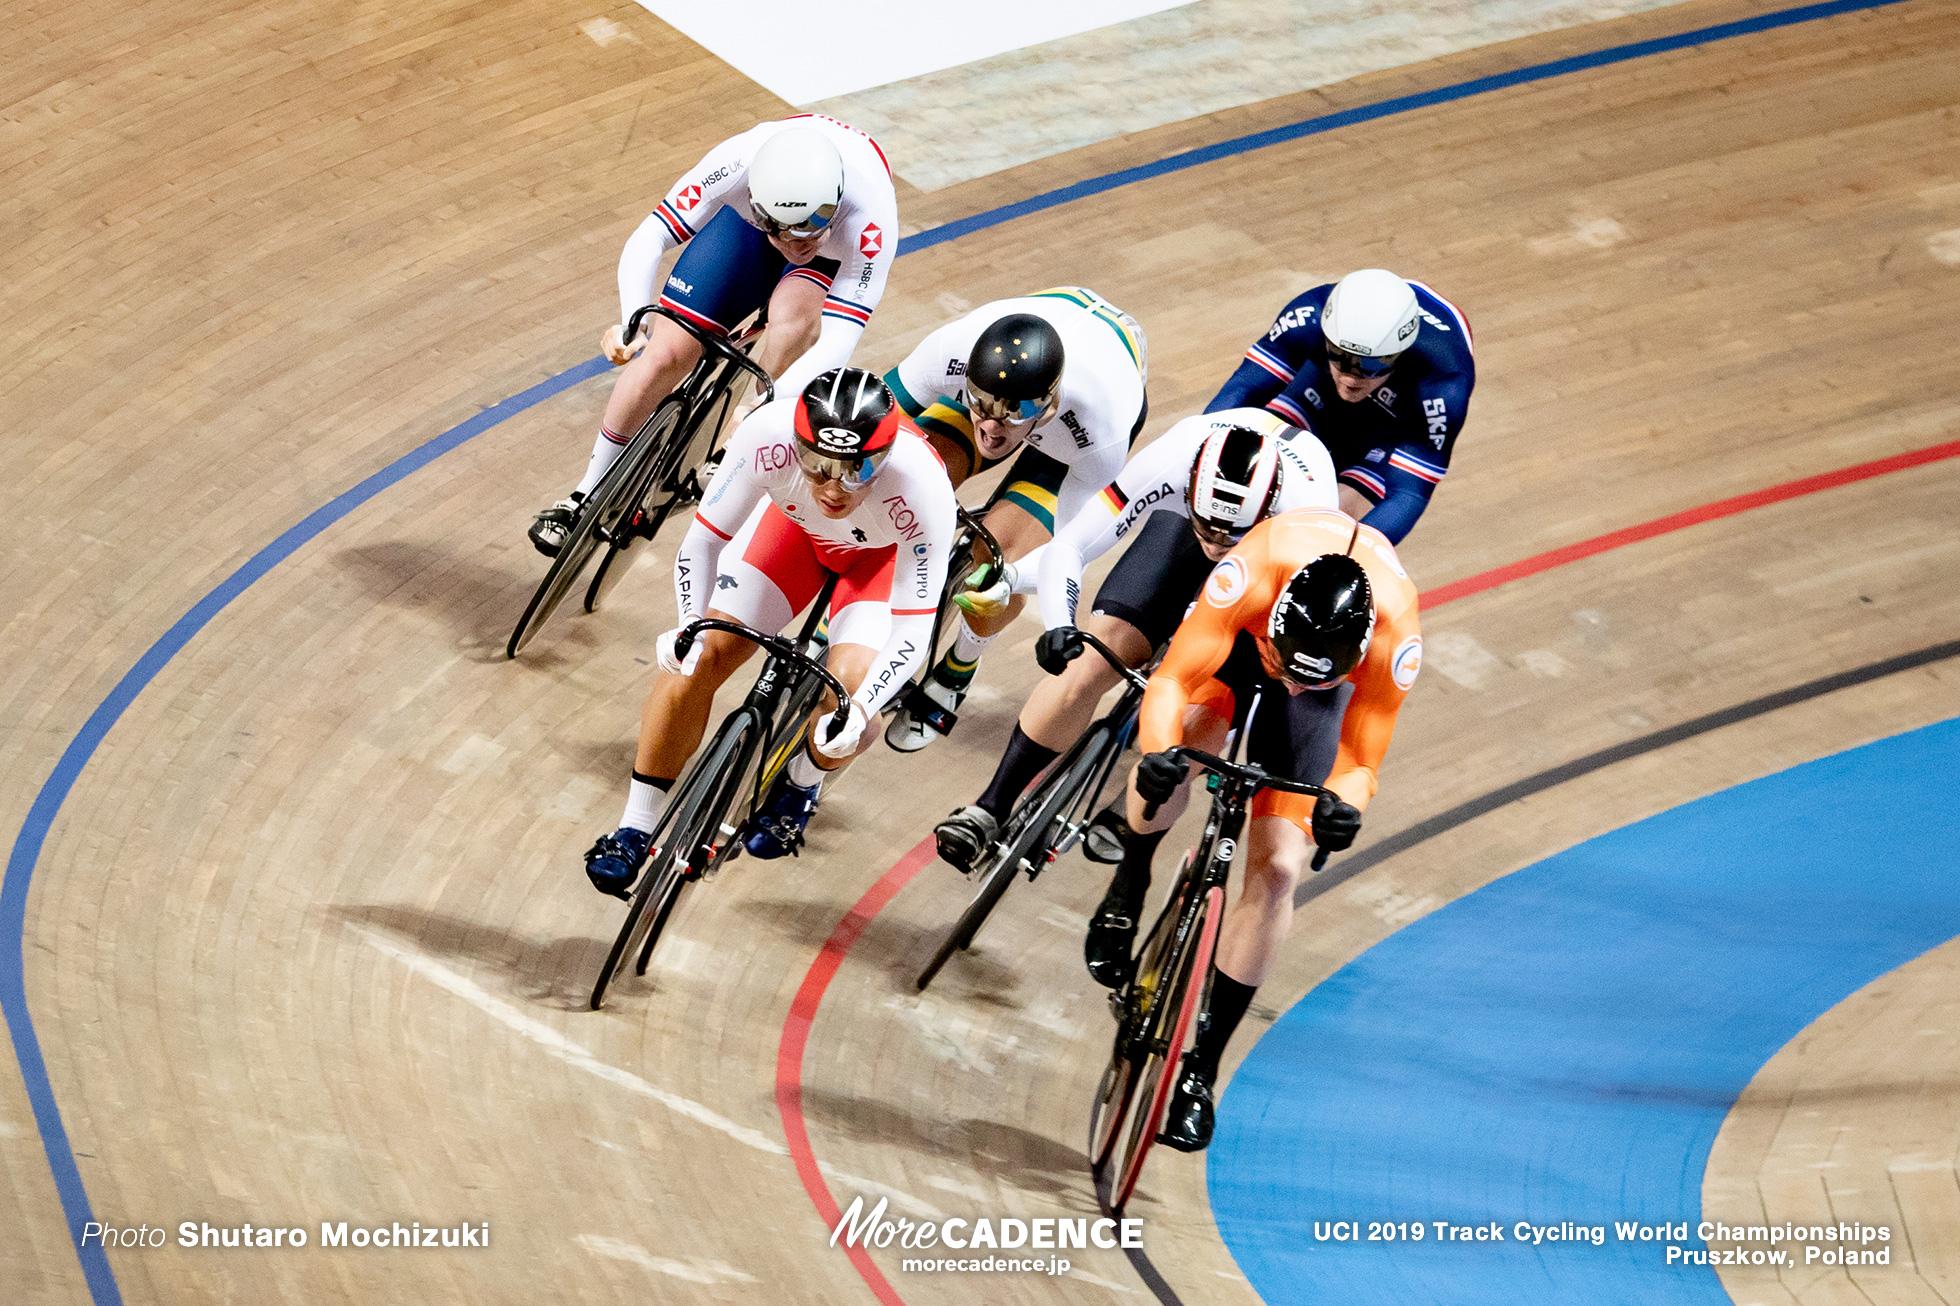 Men's Keirin Final / 2019 Track Cycling World Championships Pruszków, Poland